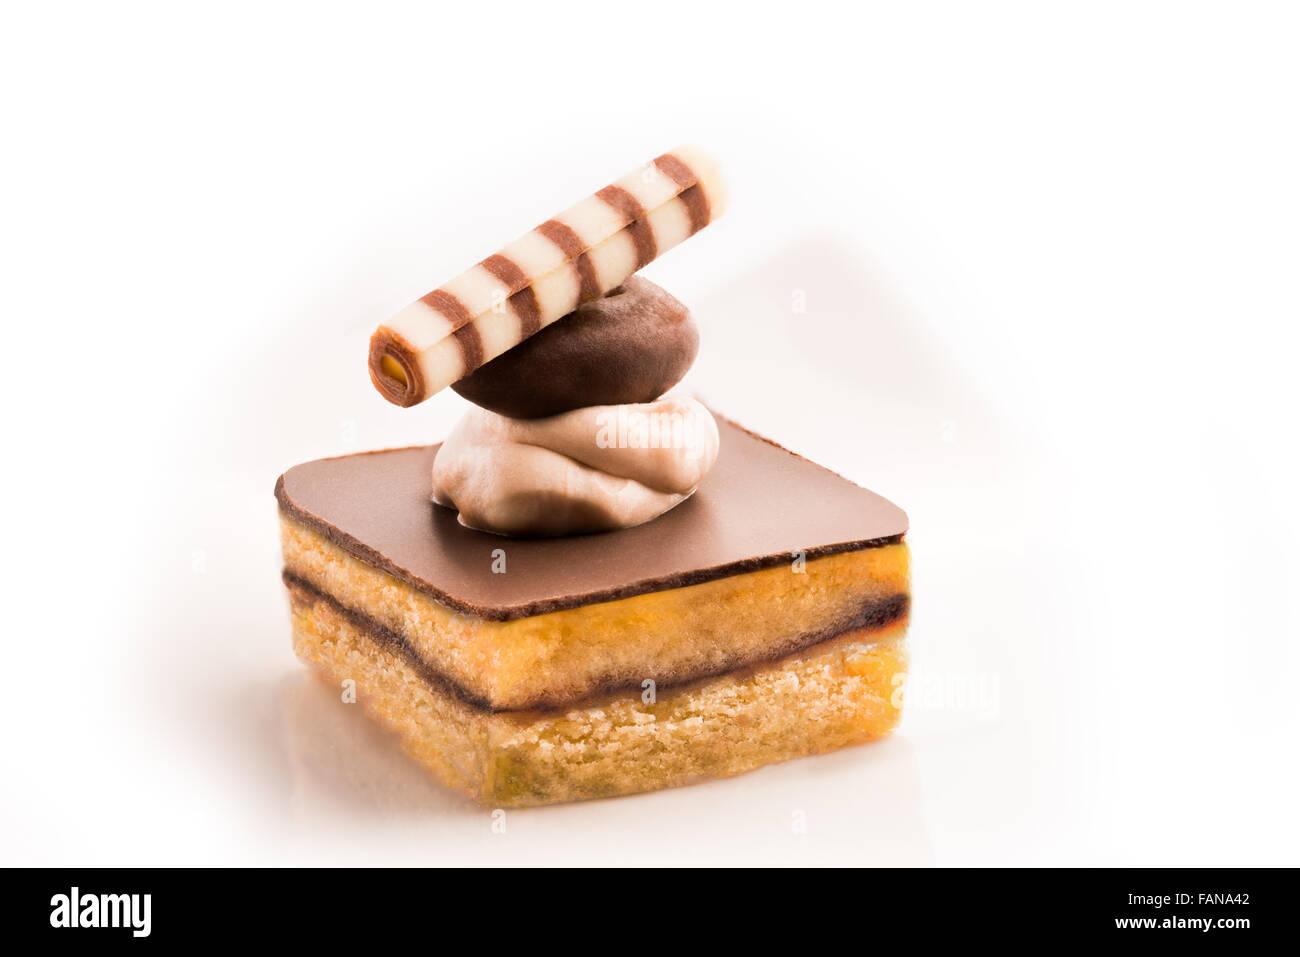 Con la exuberante decoración de galletas, chocolate, crema, buttercream, pasteles, bollos, nata, noisette, Cuarteado, Foto de stock